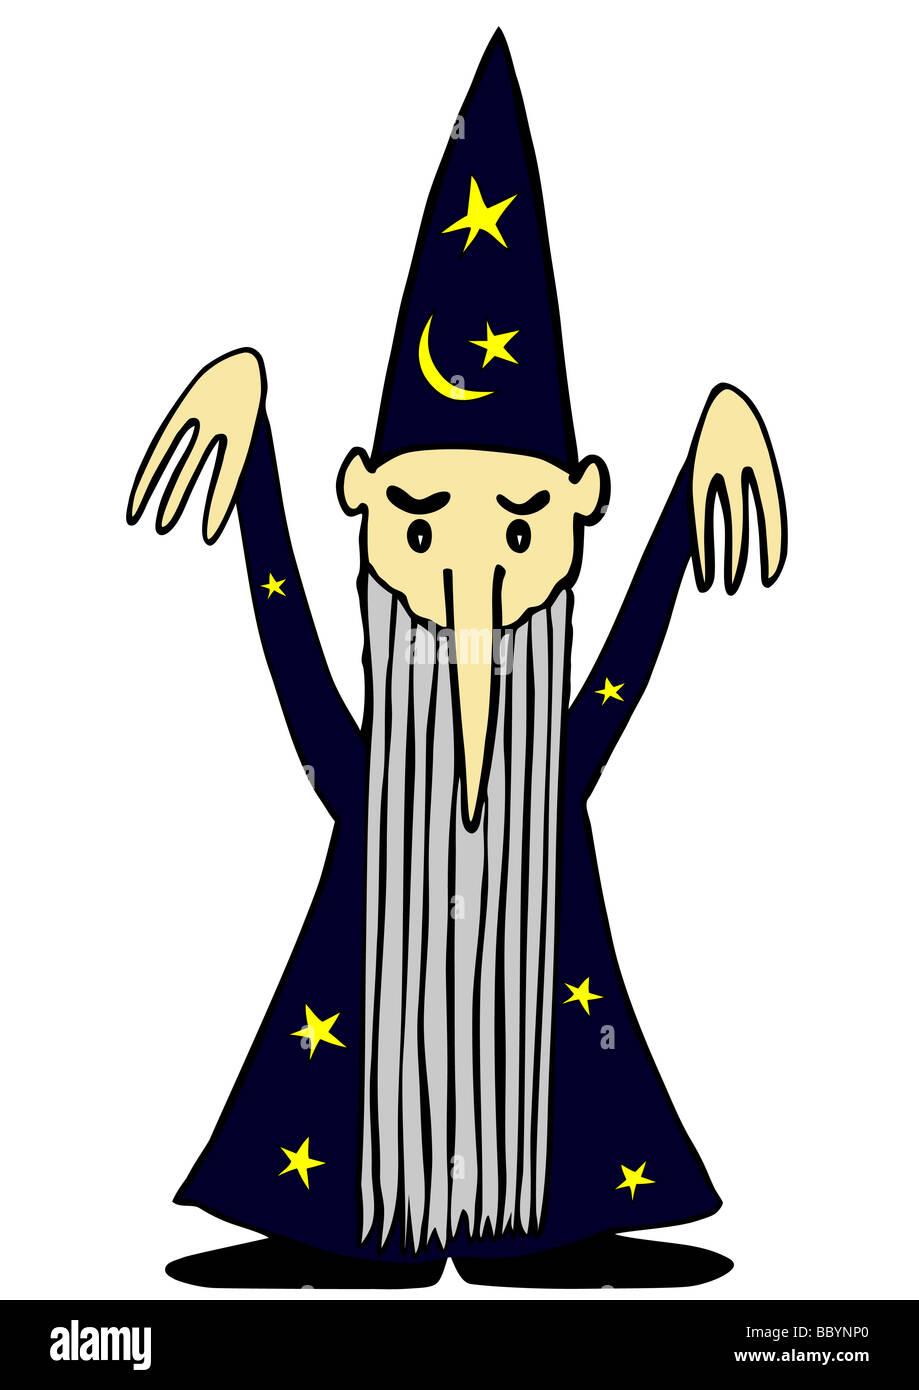 magician - Stock Image